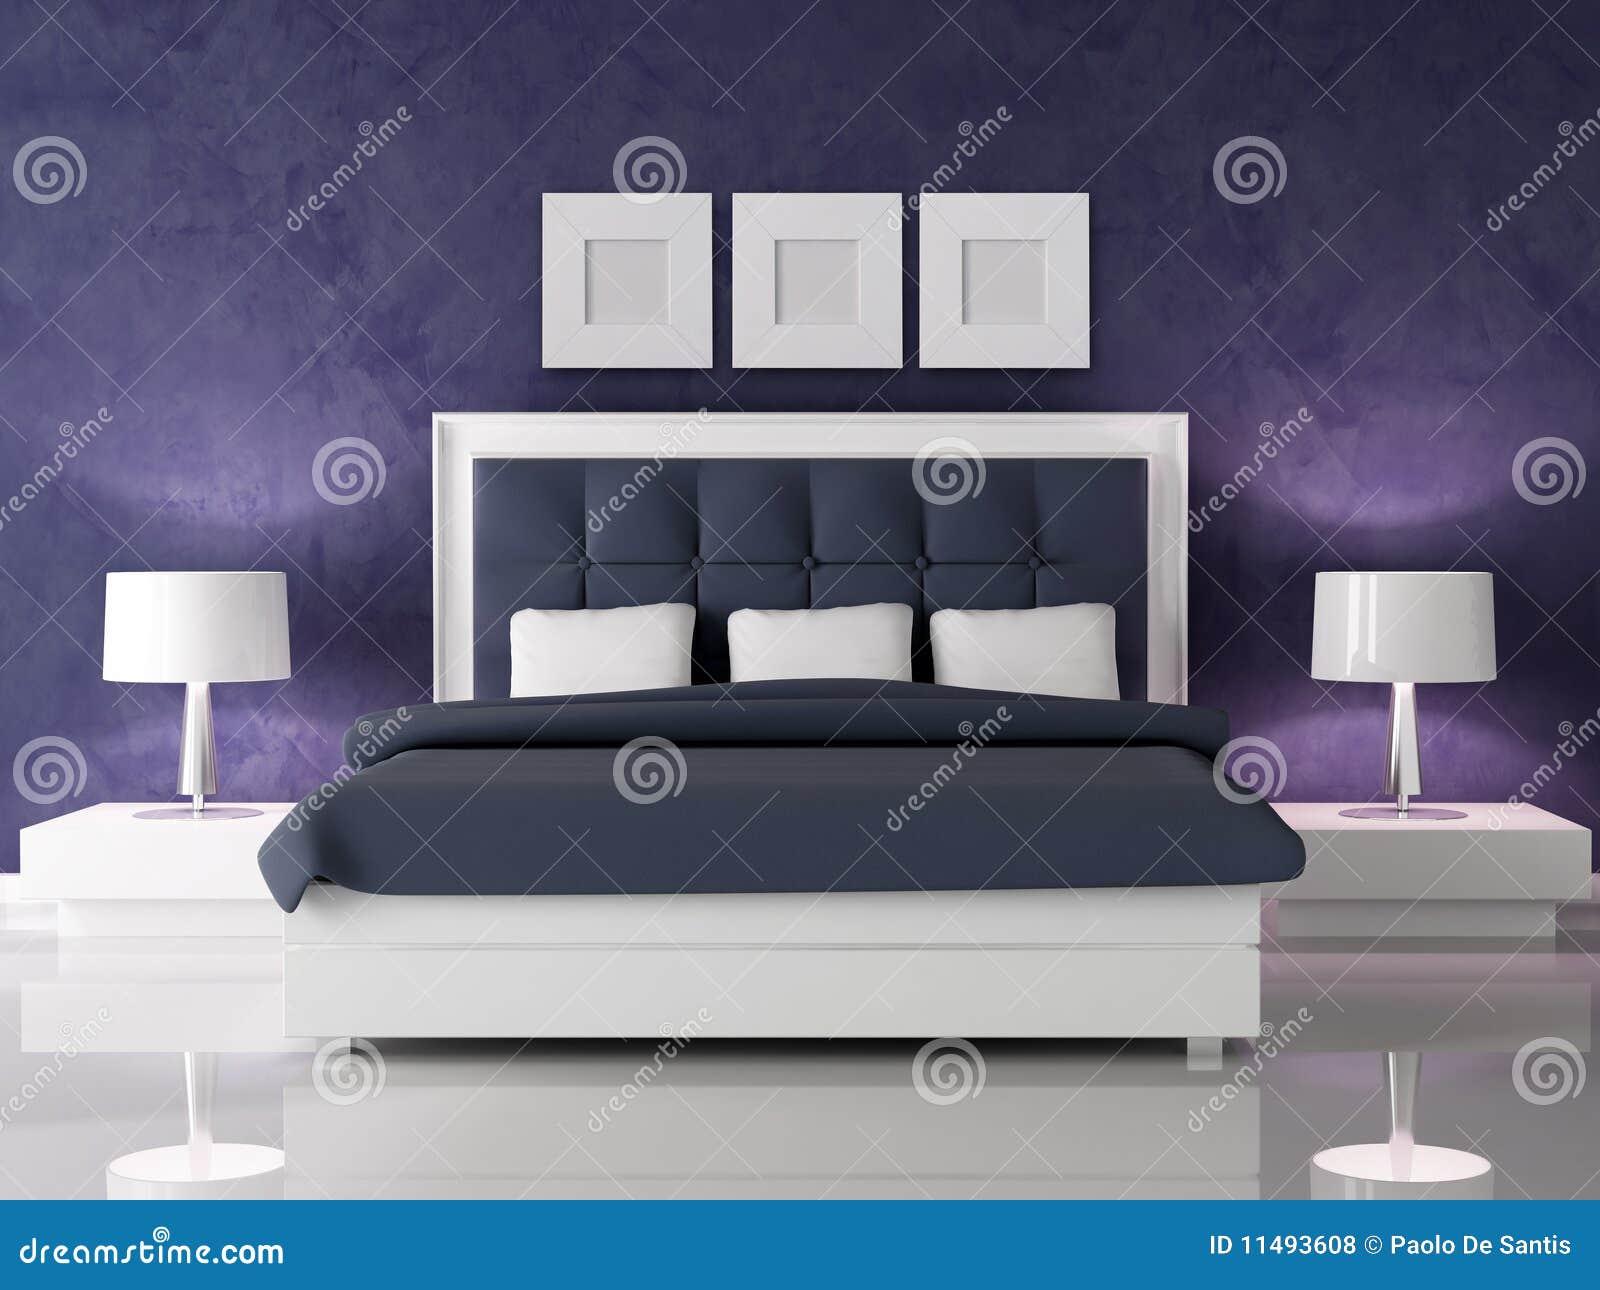 Dark Purple Bedroom Royalty Free Stock Photos Image